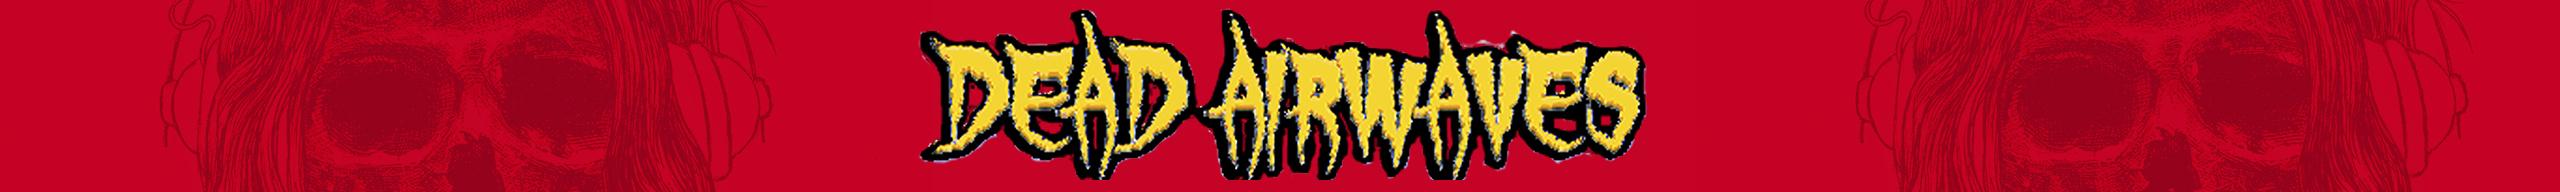 Dead Airwaves Banner